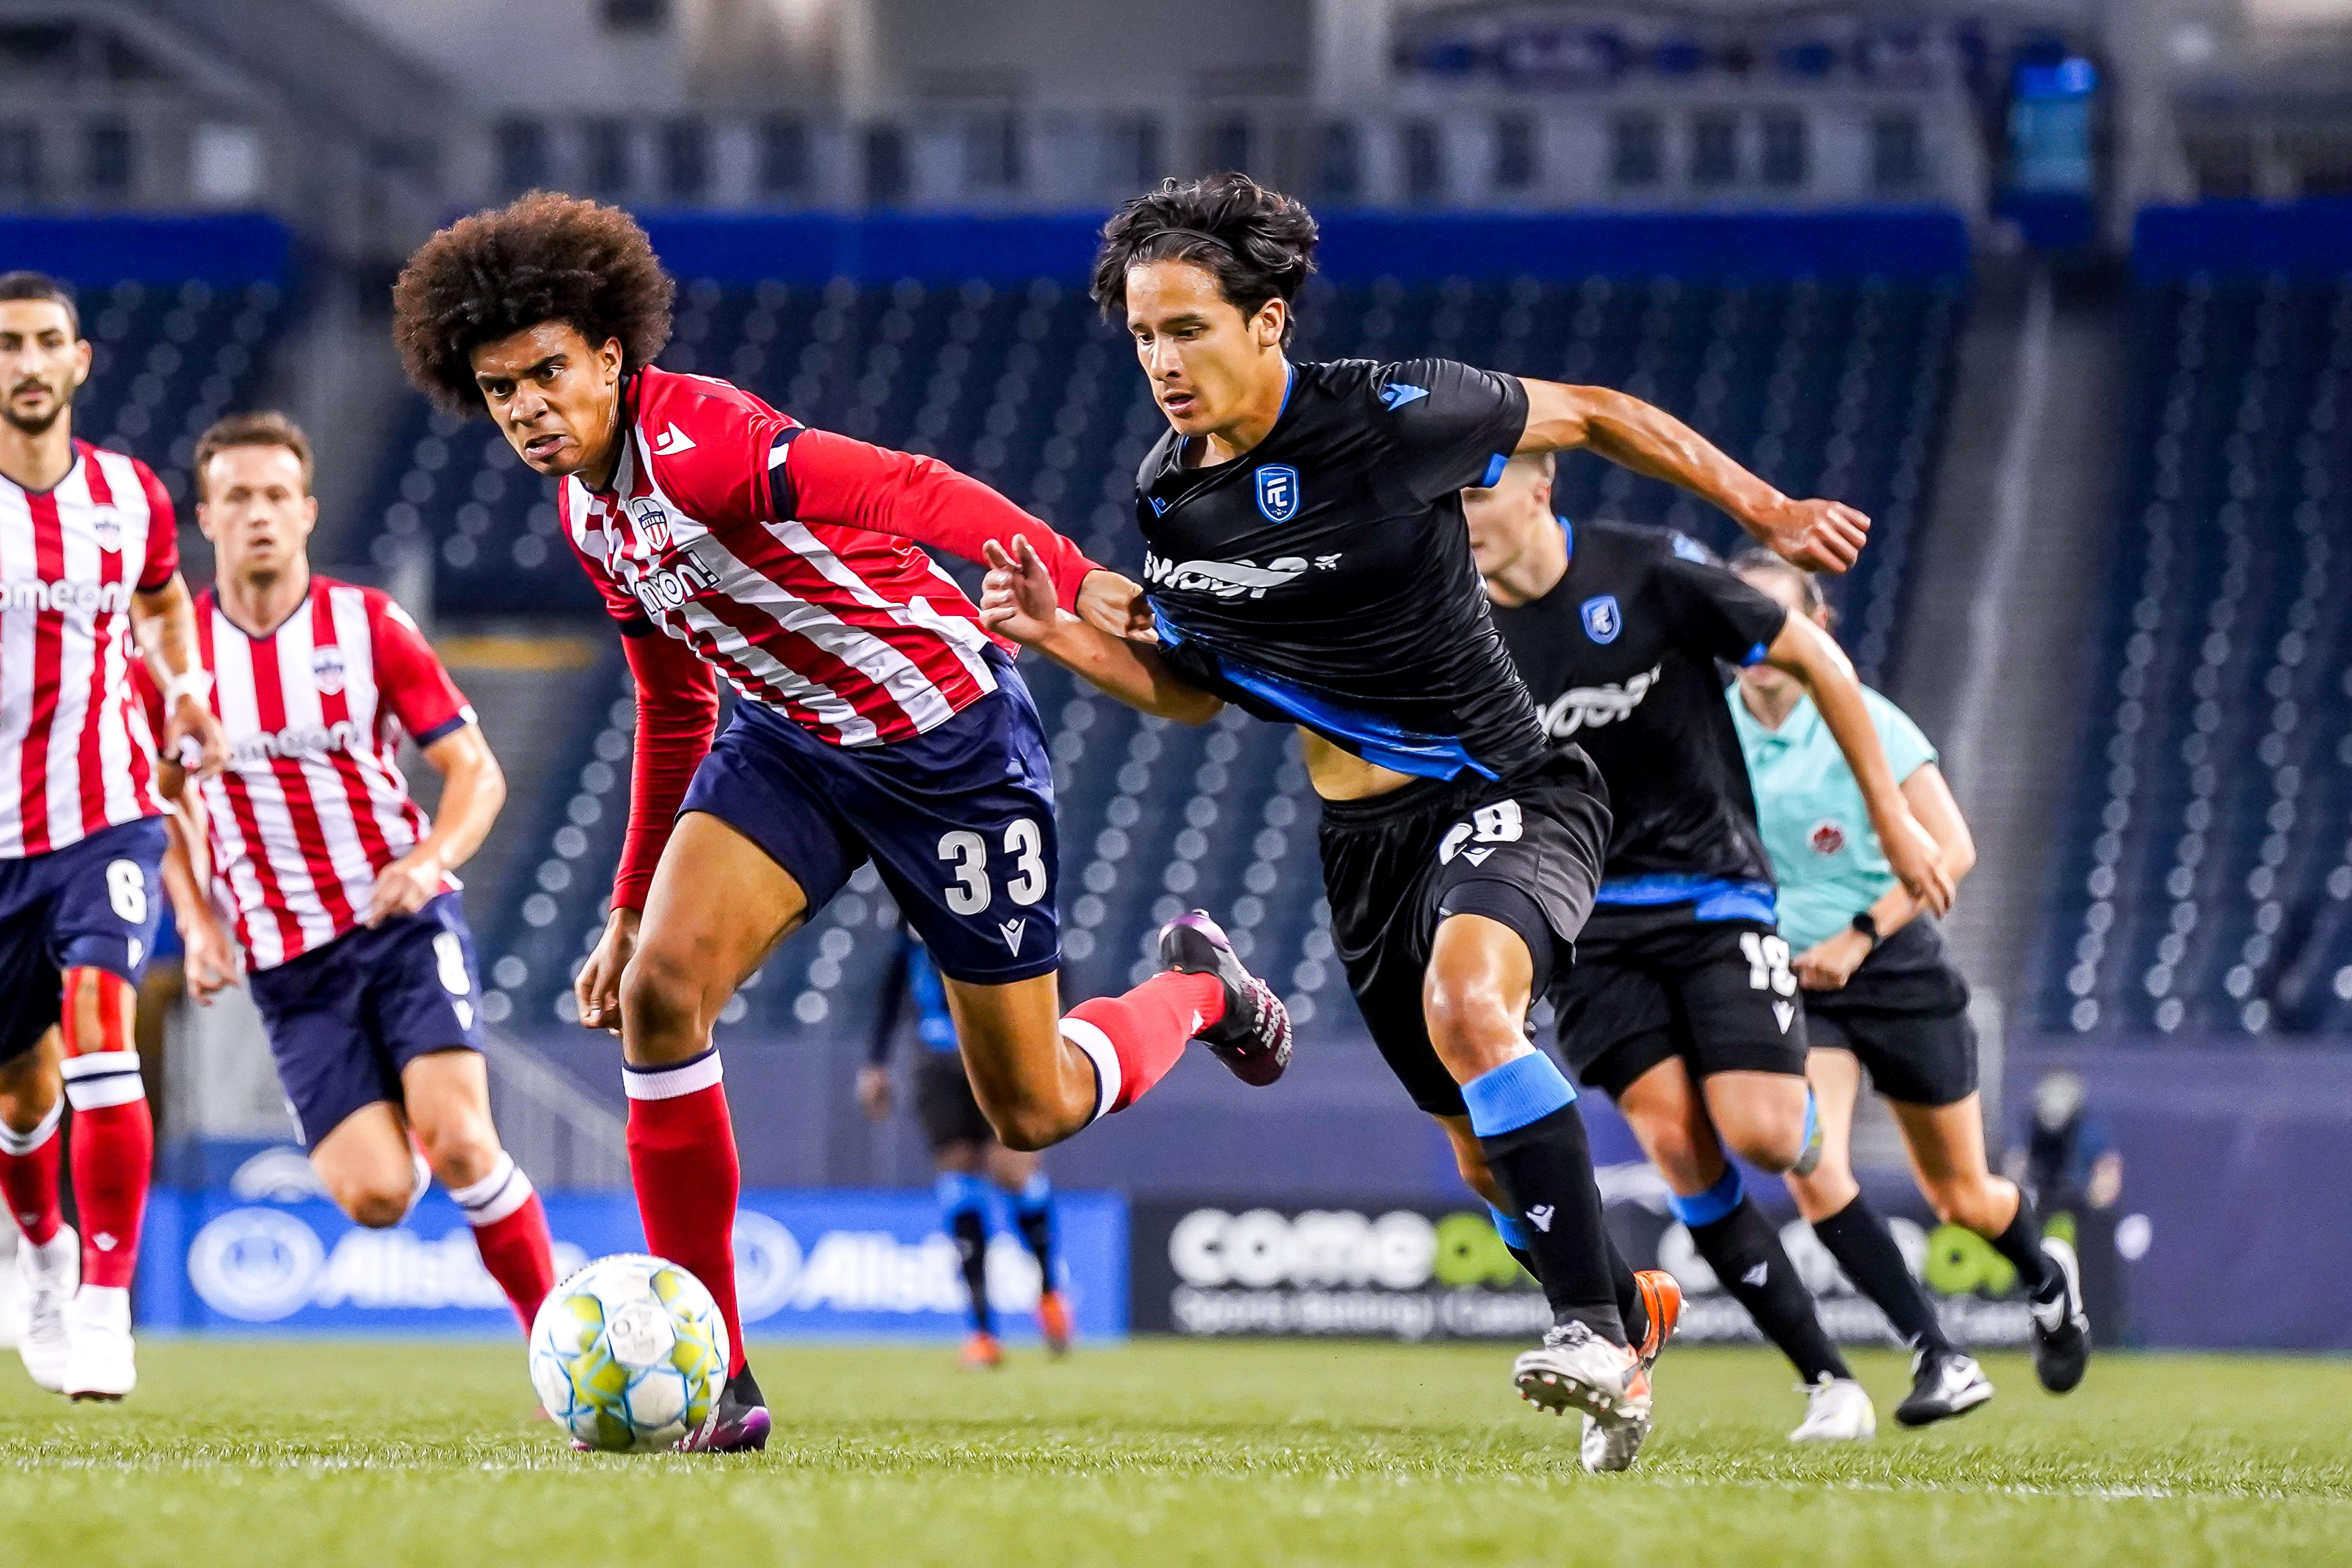 July 18, 2021. Atlético Ottawa vs FC Edmonton. First-Half. Keesean Ferdinand of Atlético Ottawa and Thomas Gardner of FC Edmonton chase the loose ball.